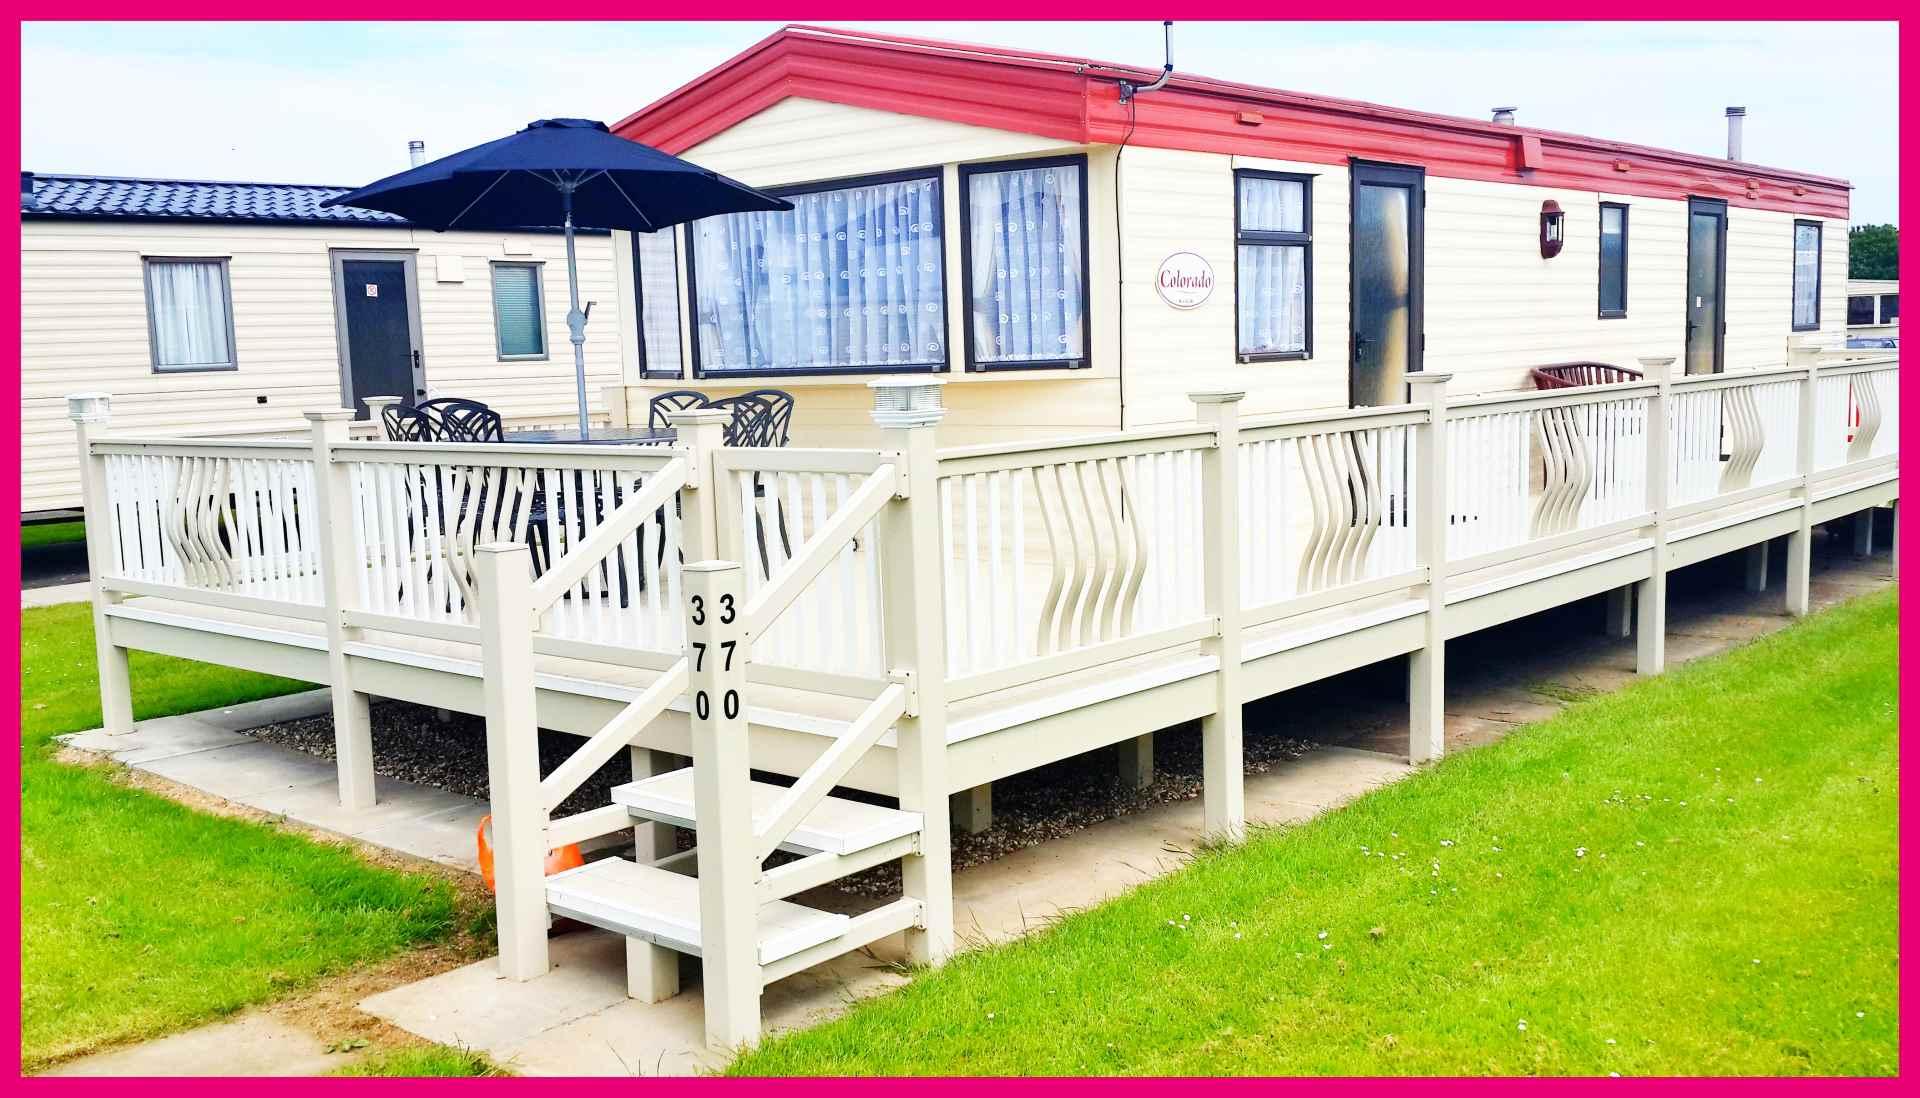 Caravan 370 veranda